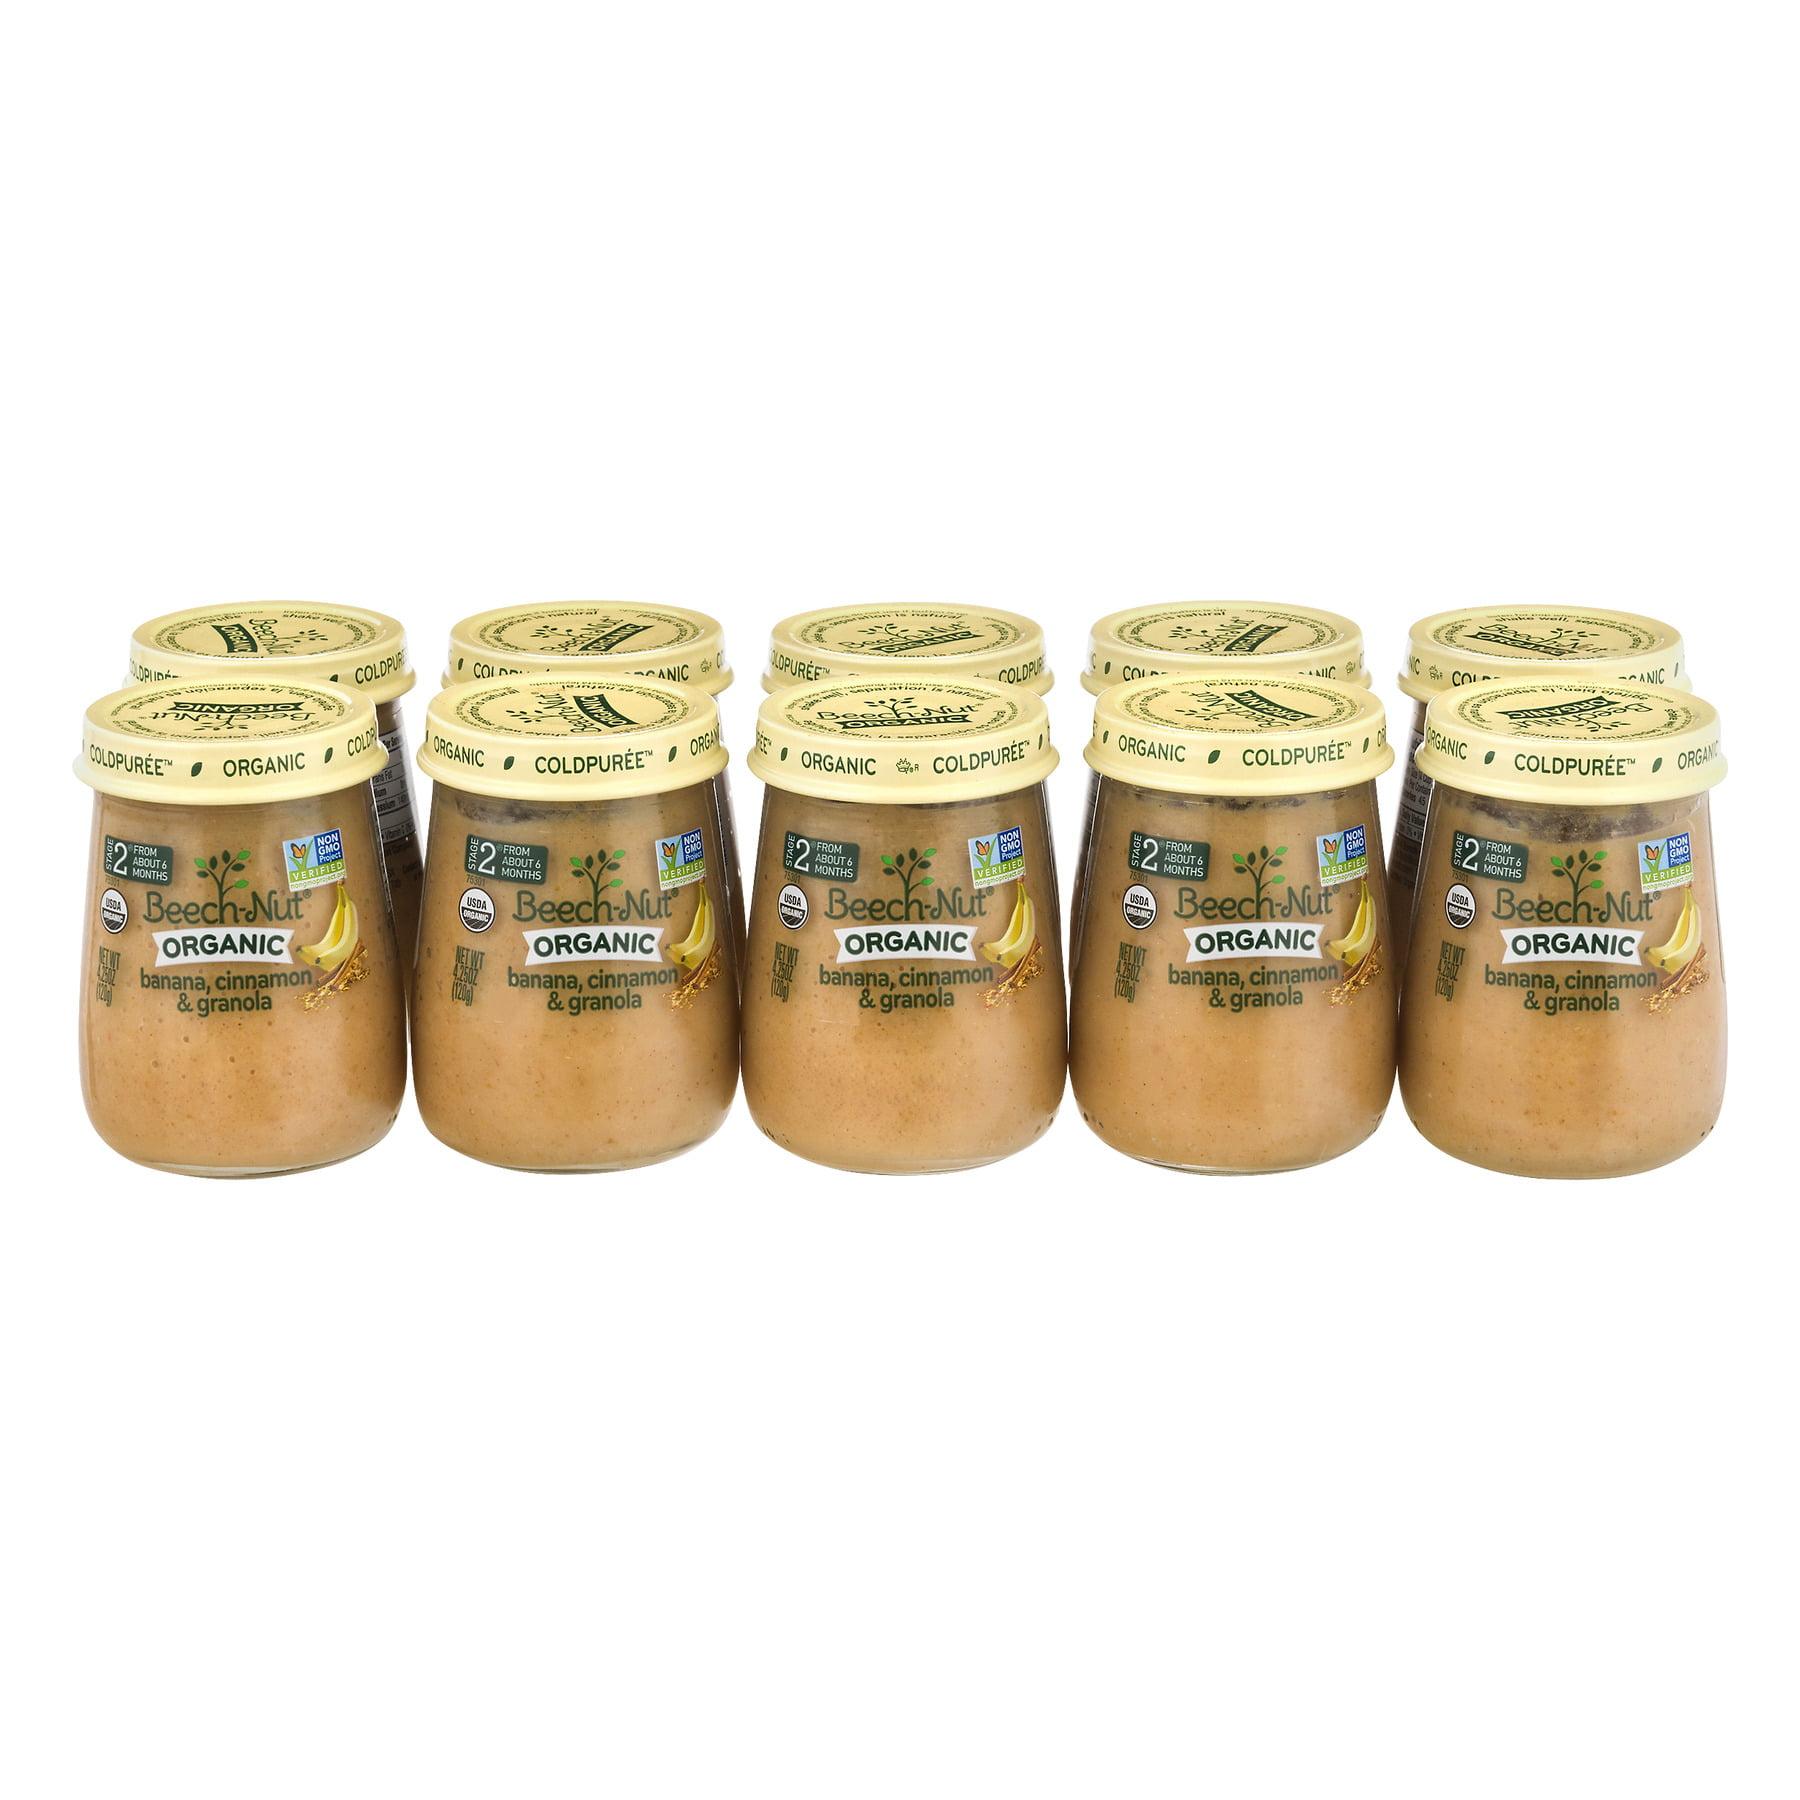 Beech-Nut Organic; Stage 2 Banana, Cinnamon & Granola Baby Food, 4.25 oz, (Pack of 10)